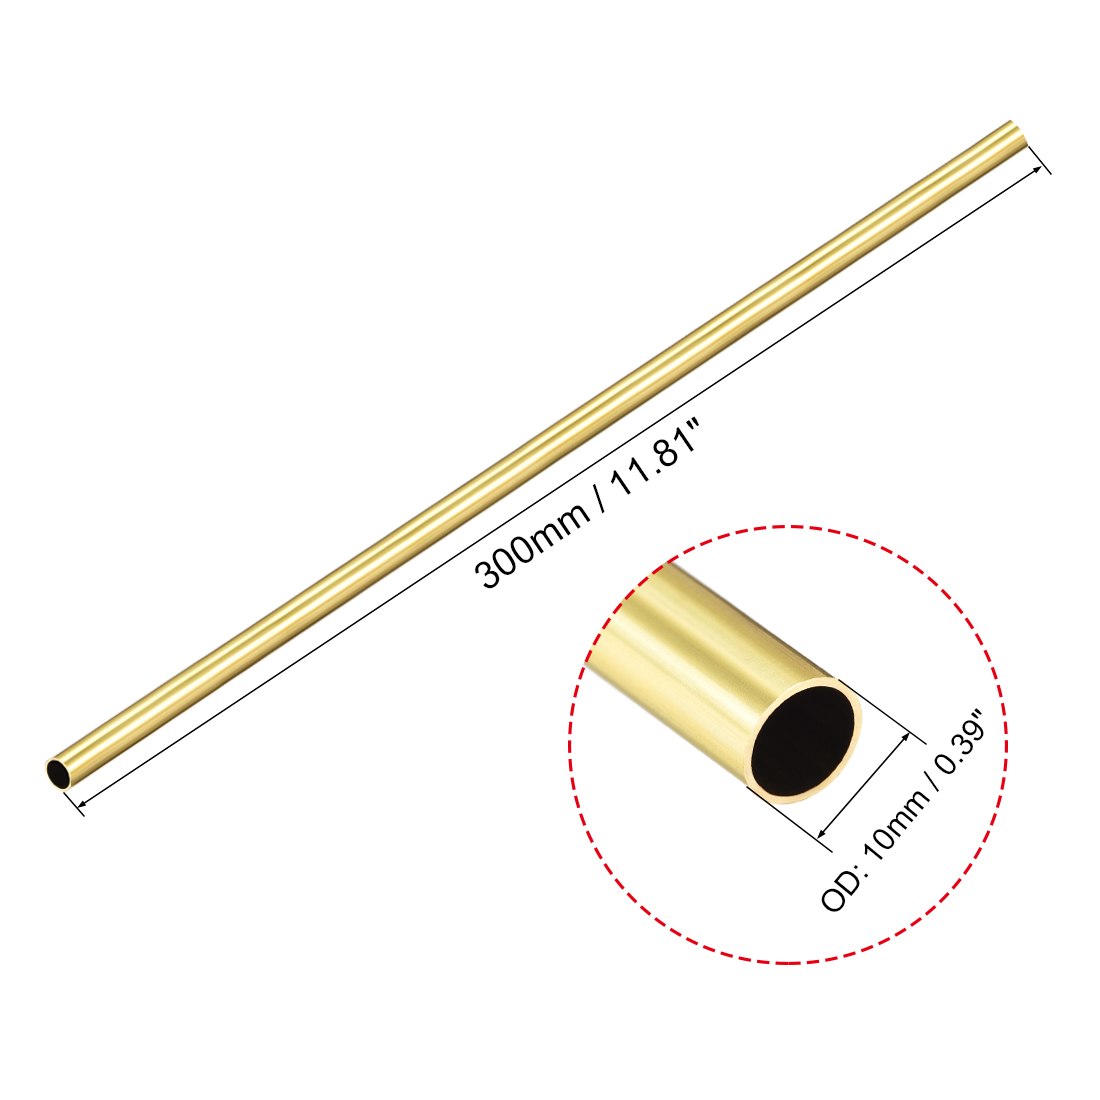 Brass Mini Channel Section 300mm Long 4mm x 4mm x 0.5mm